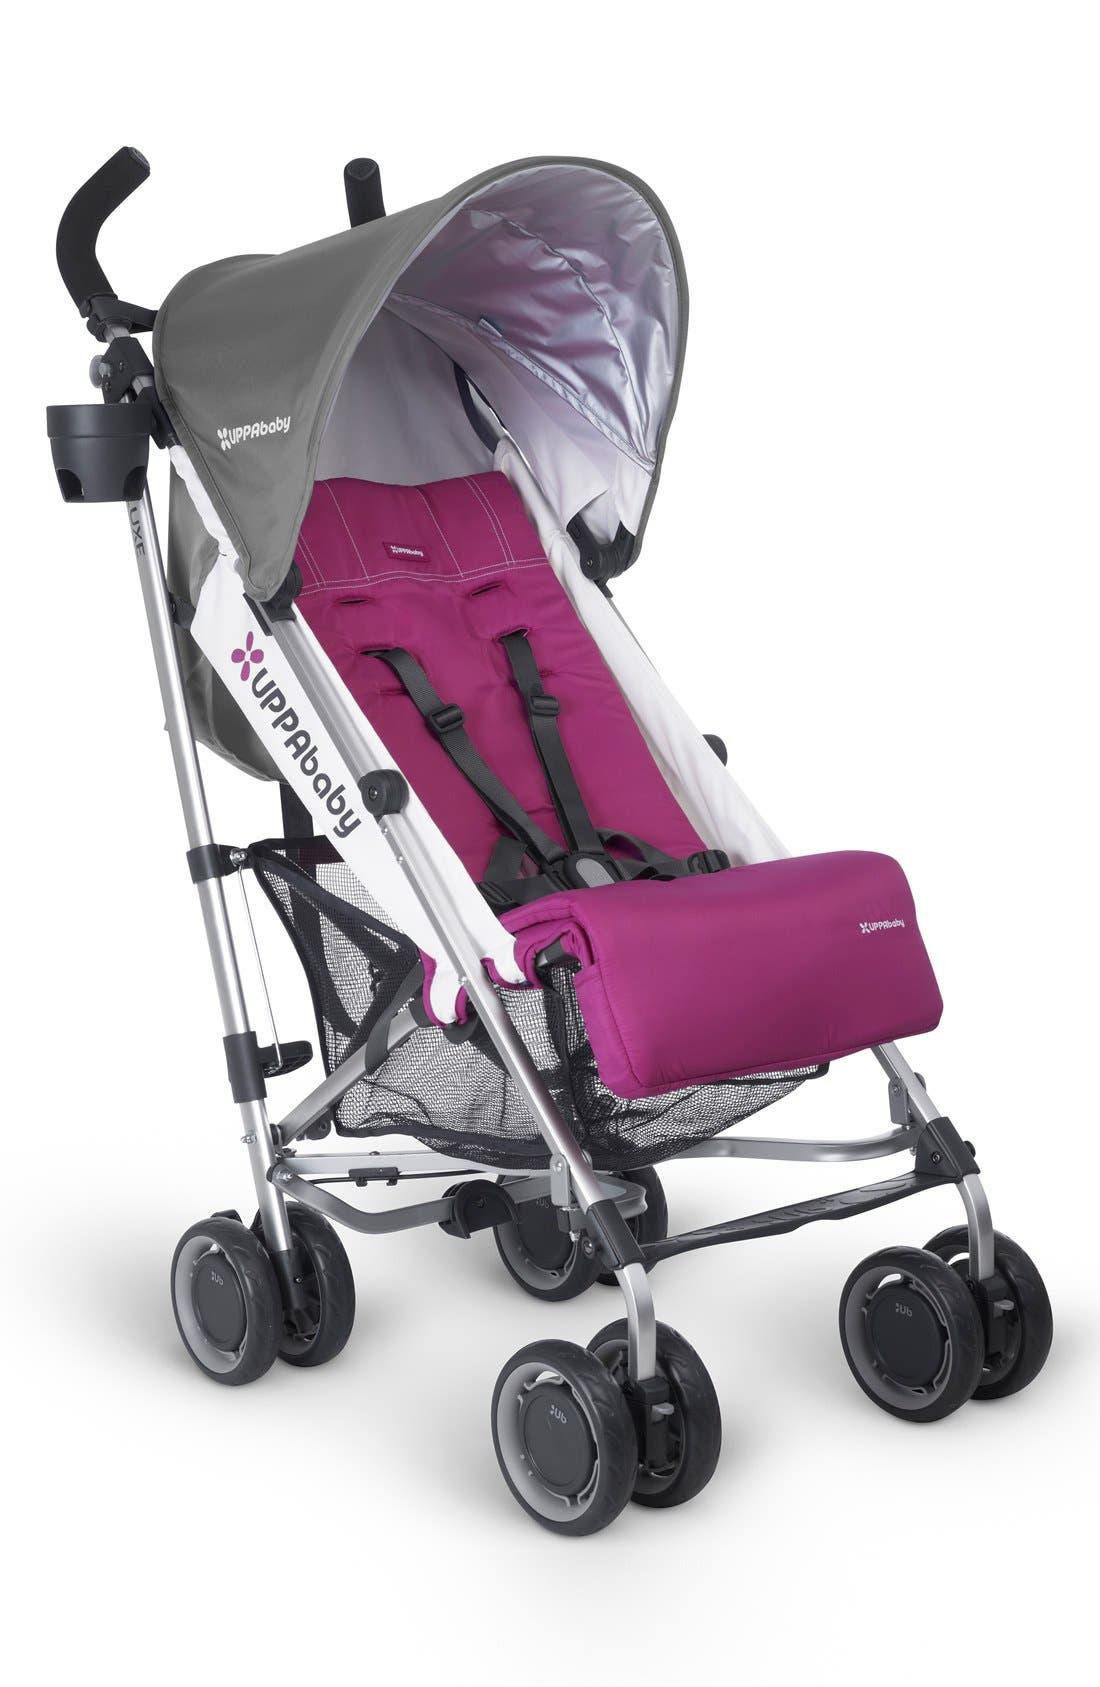 2015 G-LUXE - Aluminum Frame Reclining Umbrella Stroller,                             Main thumbnail 4, color,